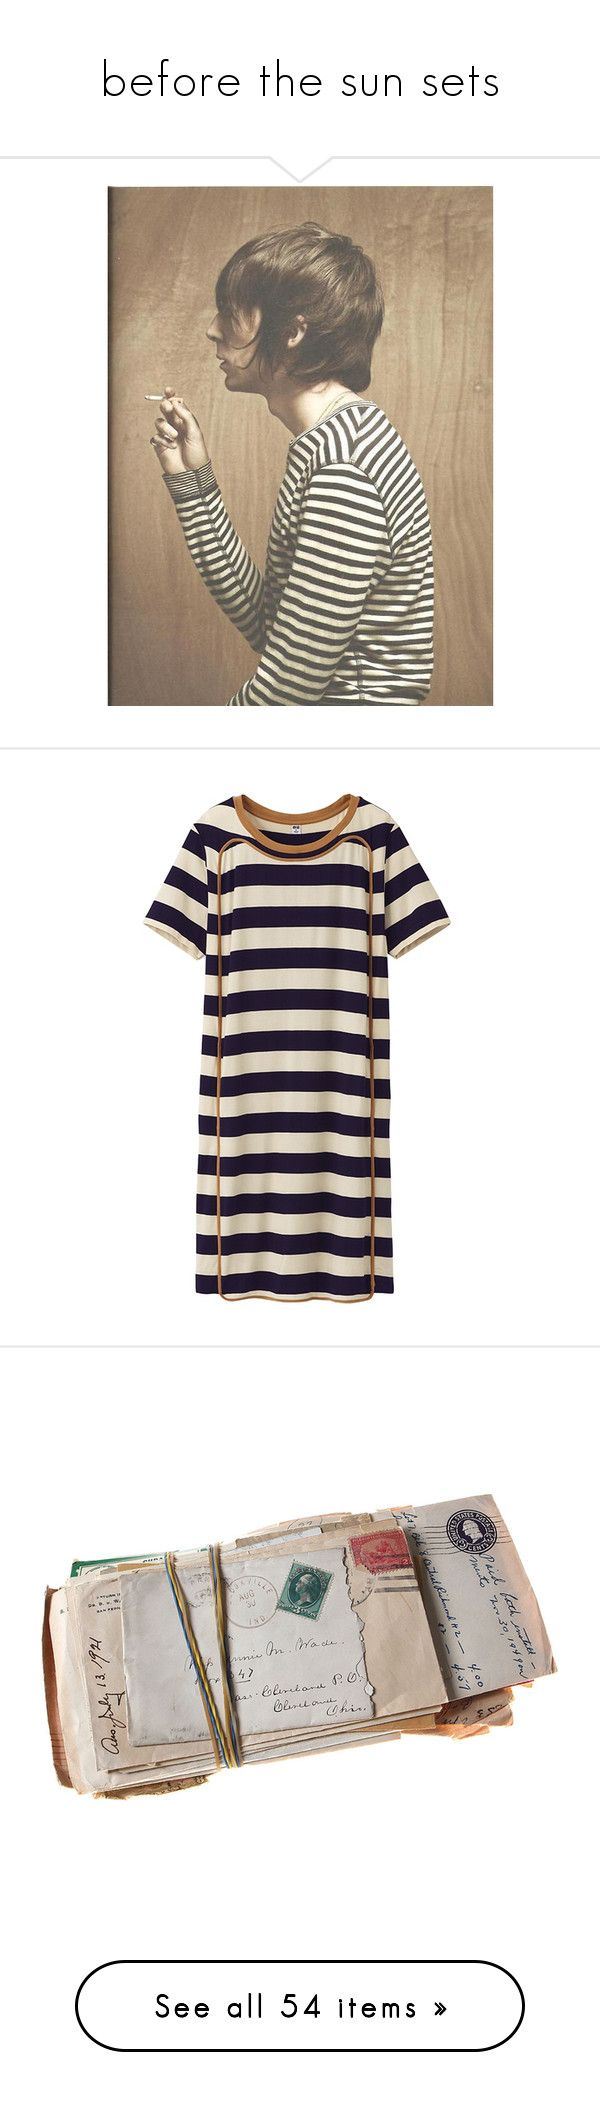 before the sun sets by kk49 on Polyvore featuring women's fashion, dresses, tops, robes, vestidos, stripe dress, uniqlo dress, short sleeve dress, short-sleeve dresses and purple striped dress